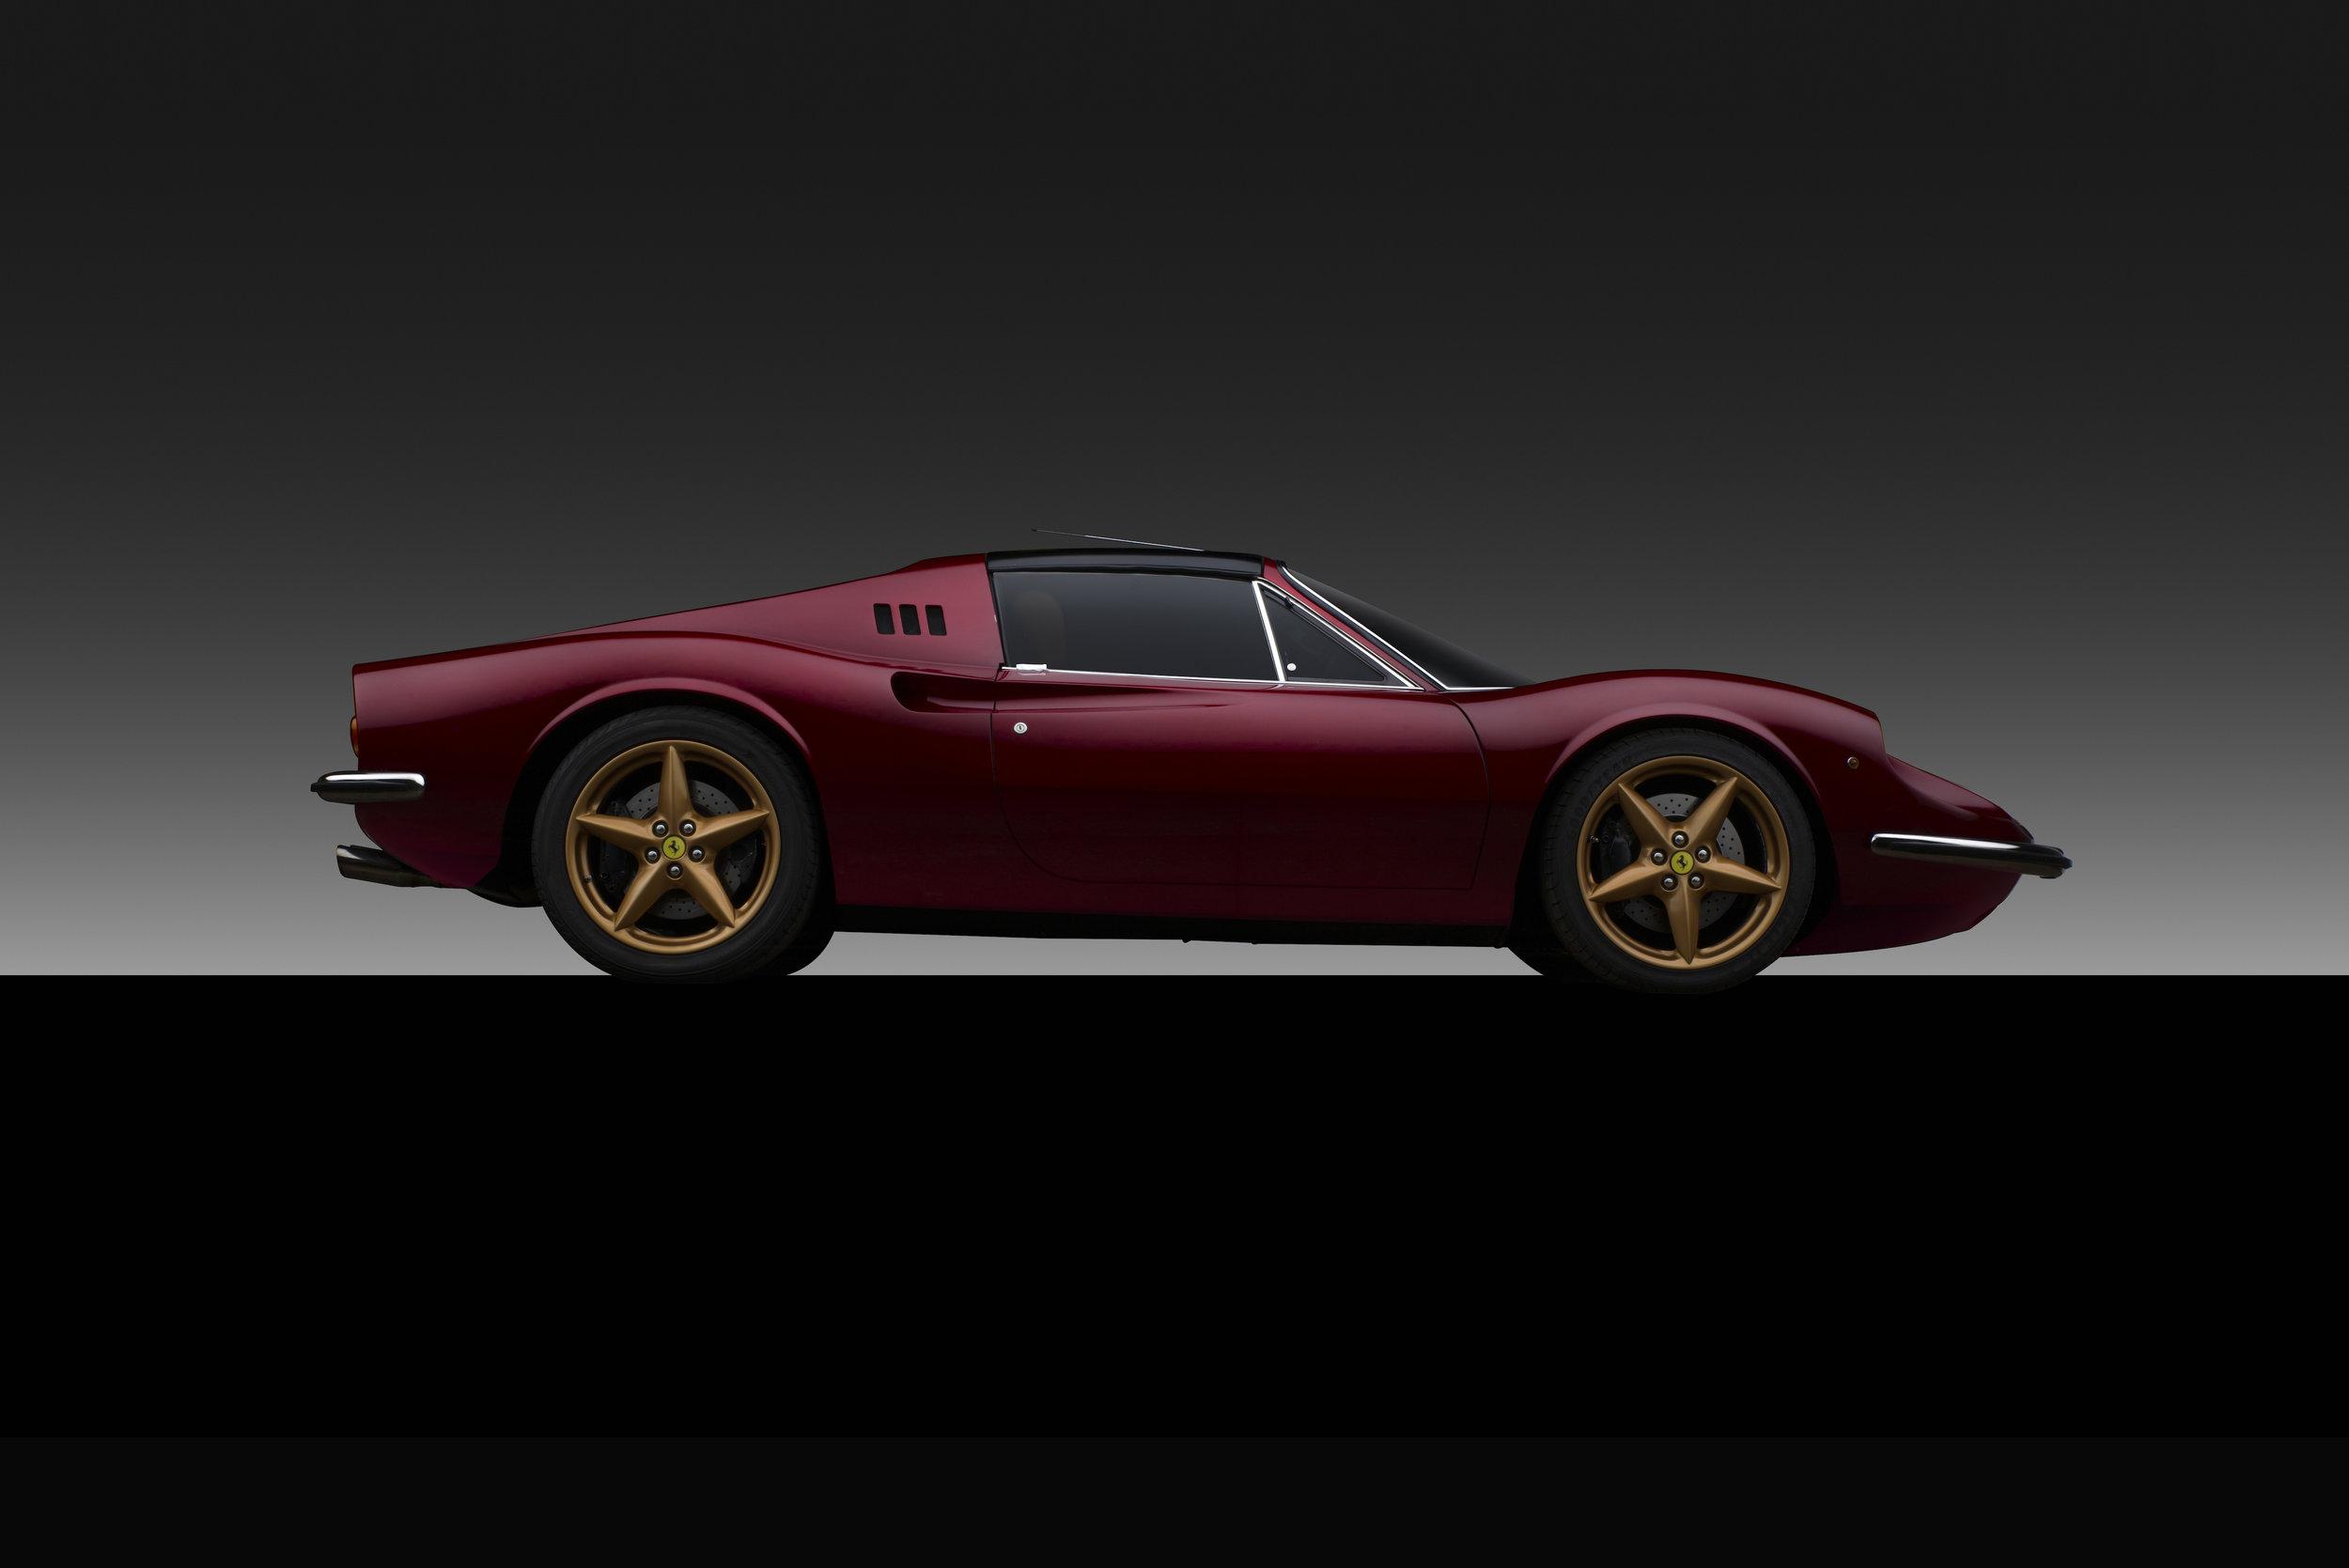 Dino 3.2 EVO Restomod with Ferrari V8 engine and Ferrari 360 18 inch wheels  Photo by   BILL PACK   of   V12 ENTERPRISES